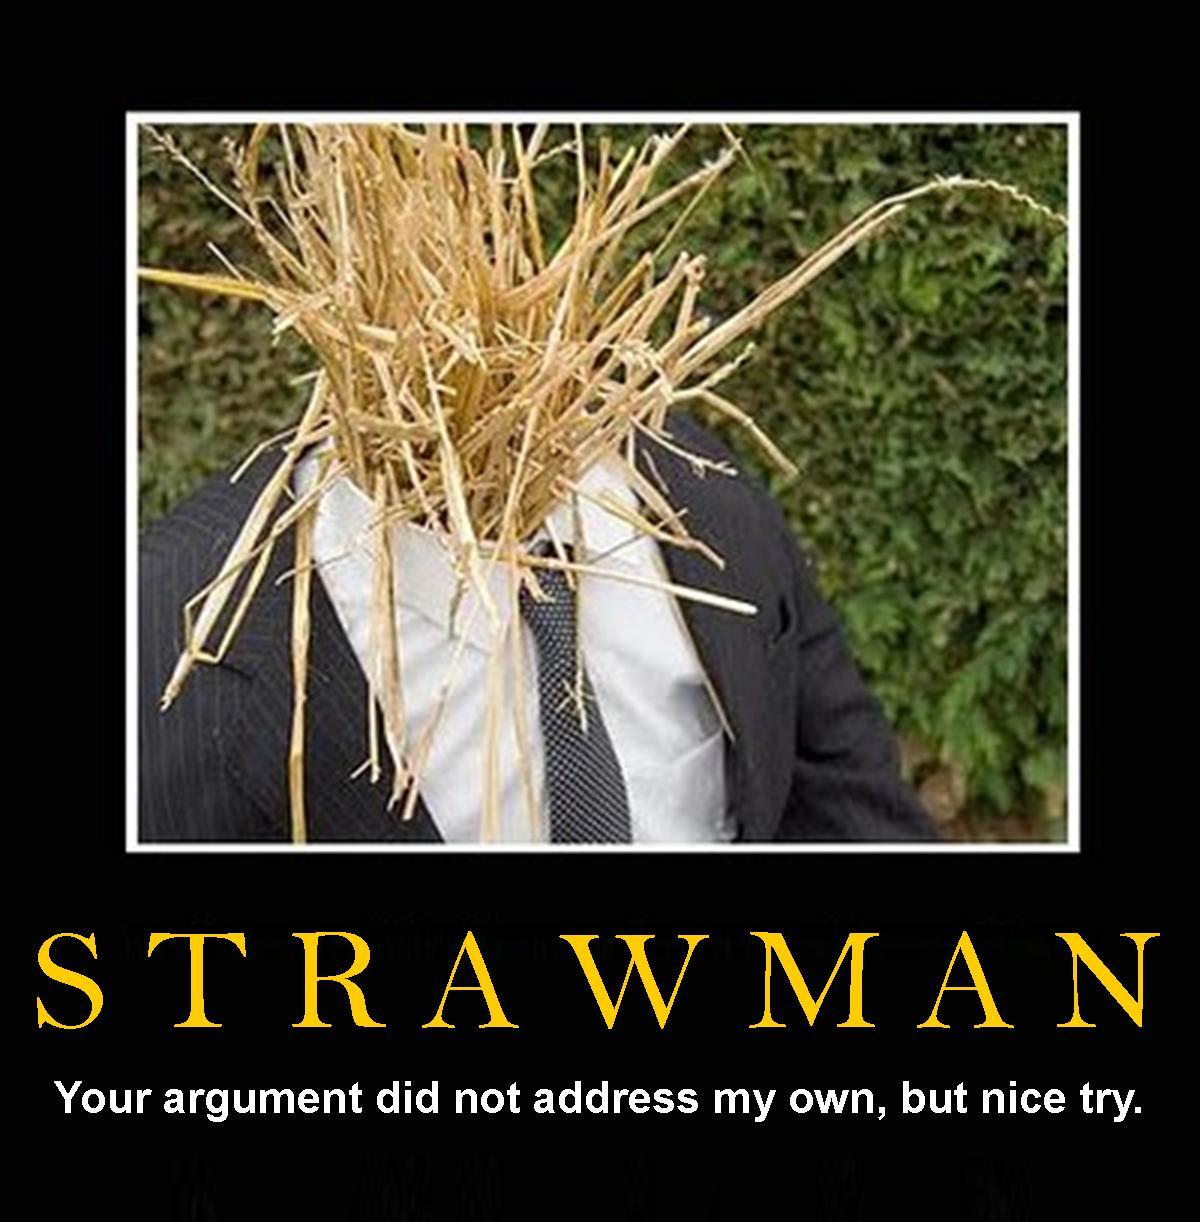 [Image: Strawman.jpg]